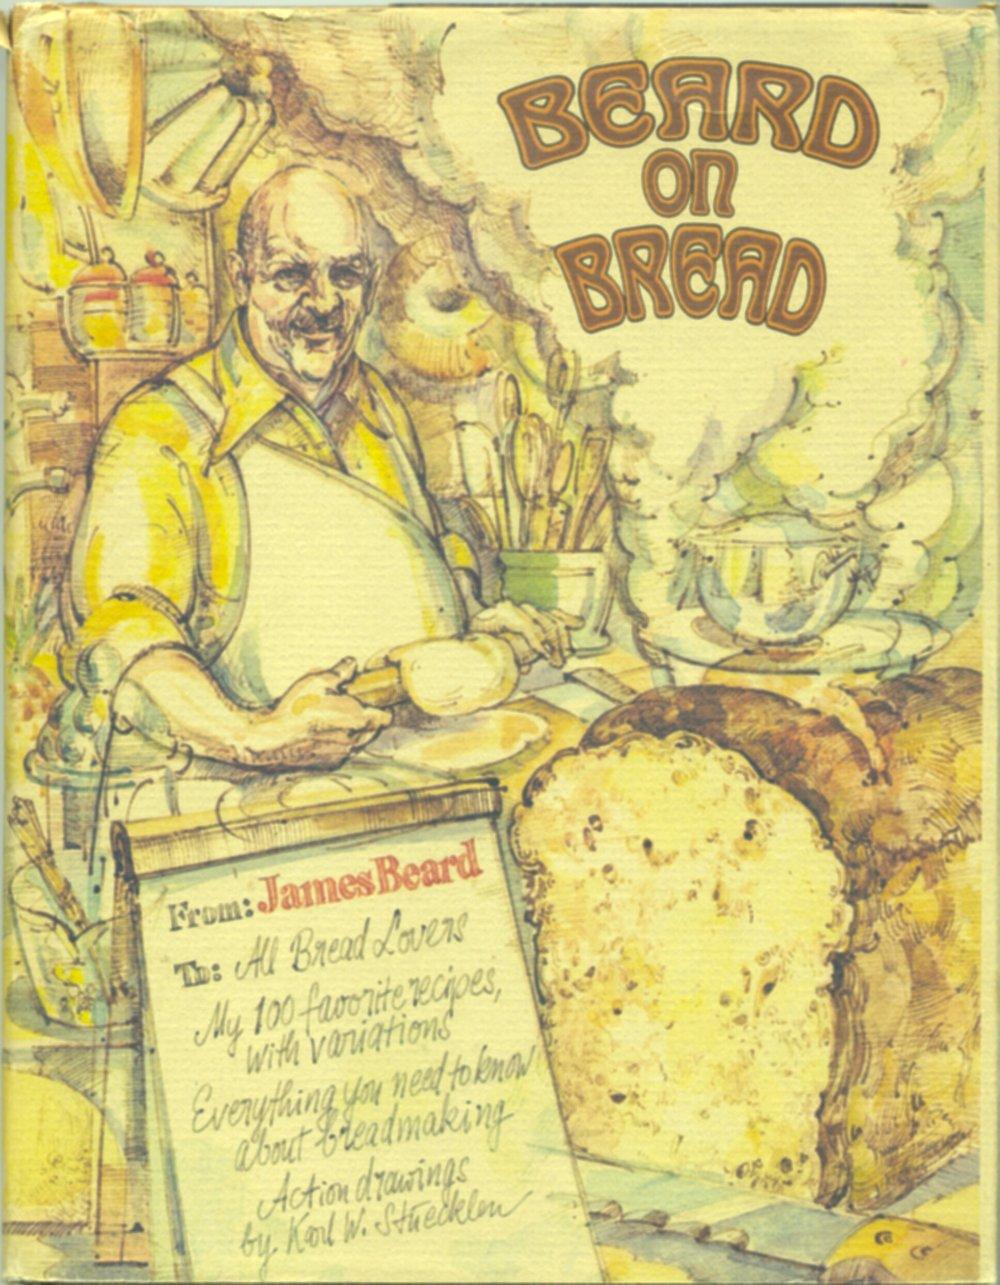 Beard on Bread, Knopf, 1981